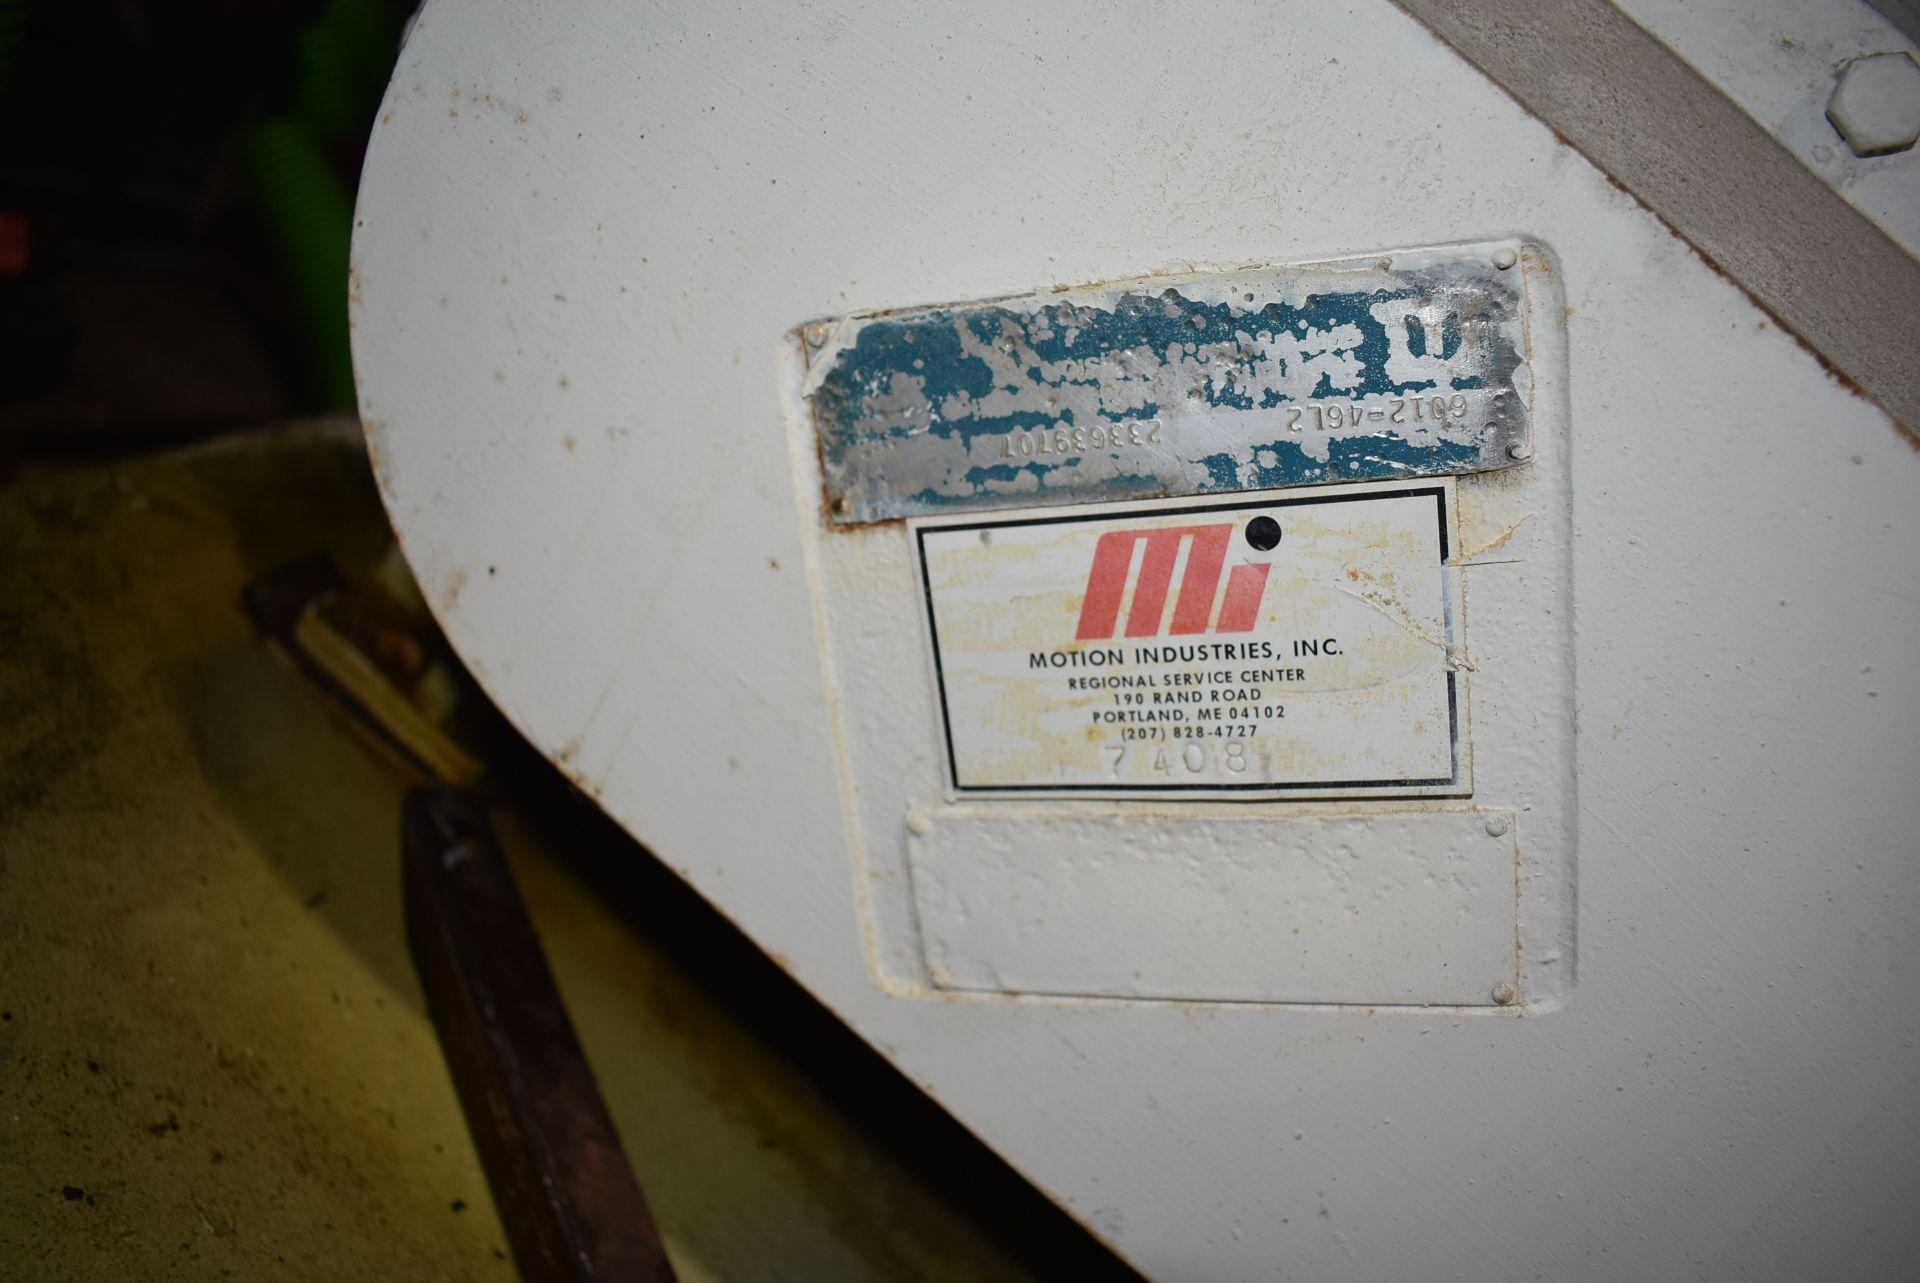 Motion Industries/Shick Tube-Veyor Blower Package w/100 HP Motor - Image 2 of 4